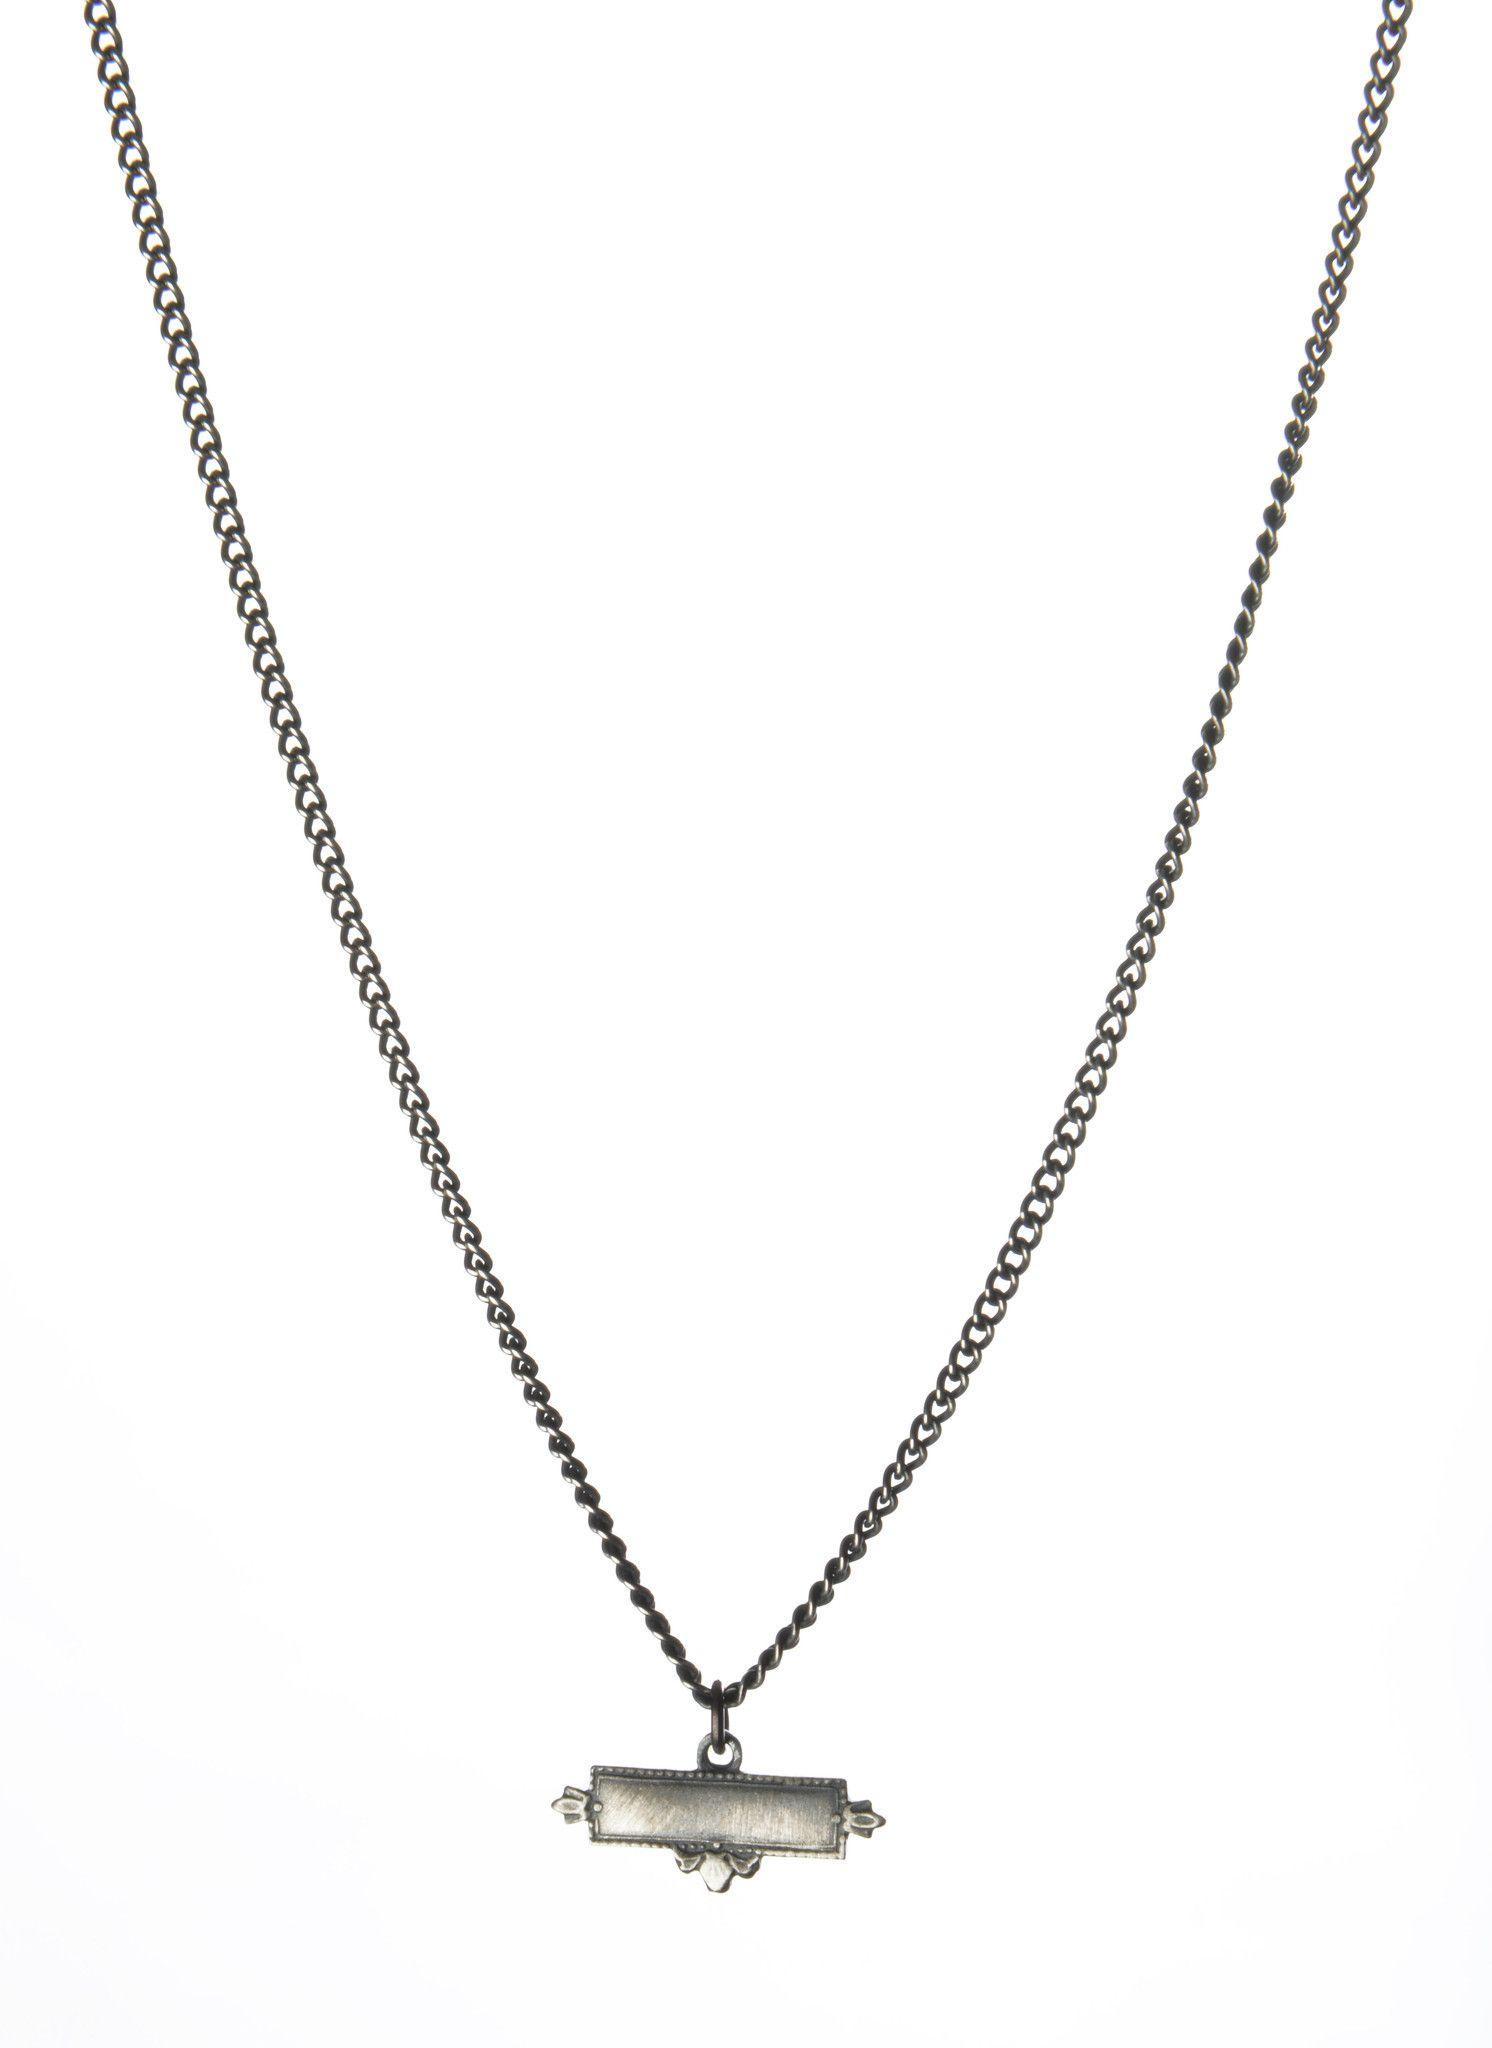 Harakiri - Fall Winter 2014 - Menswear  // Small Chain Necklace With Pendant Men's Jewelry